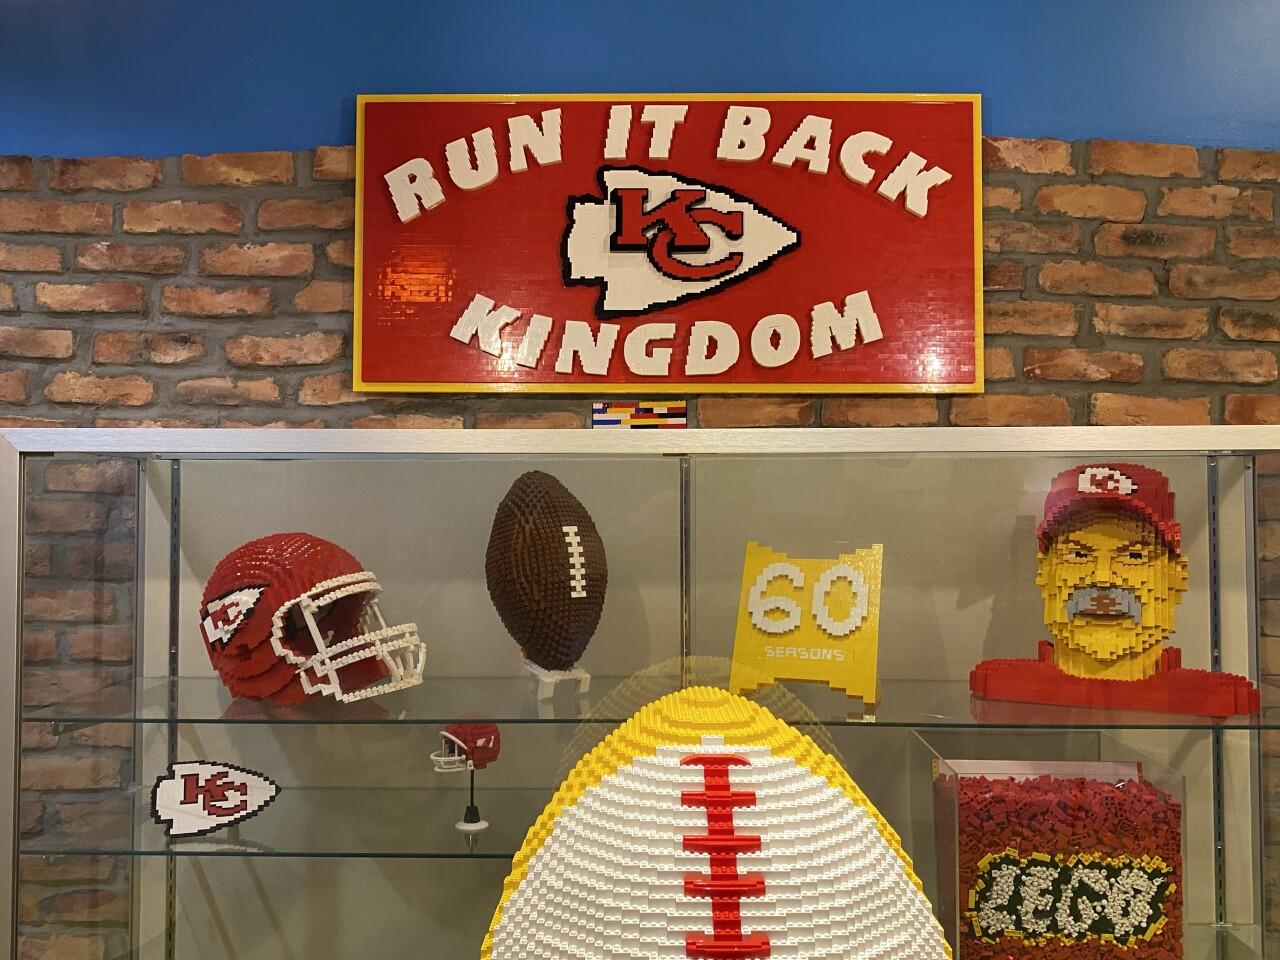 Chiefs Run It Back legoland.jpg